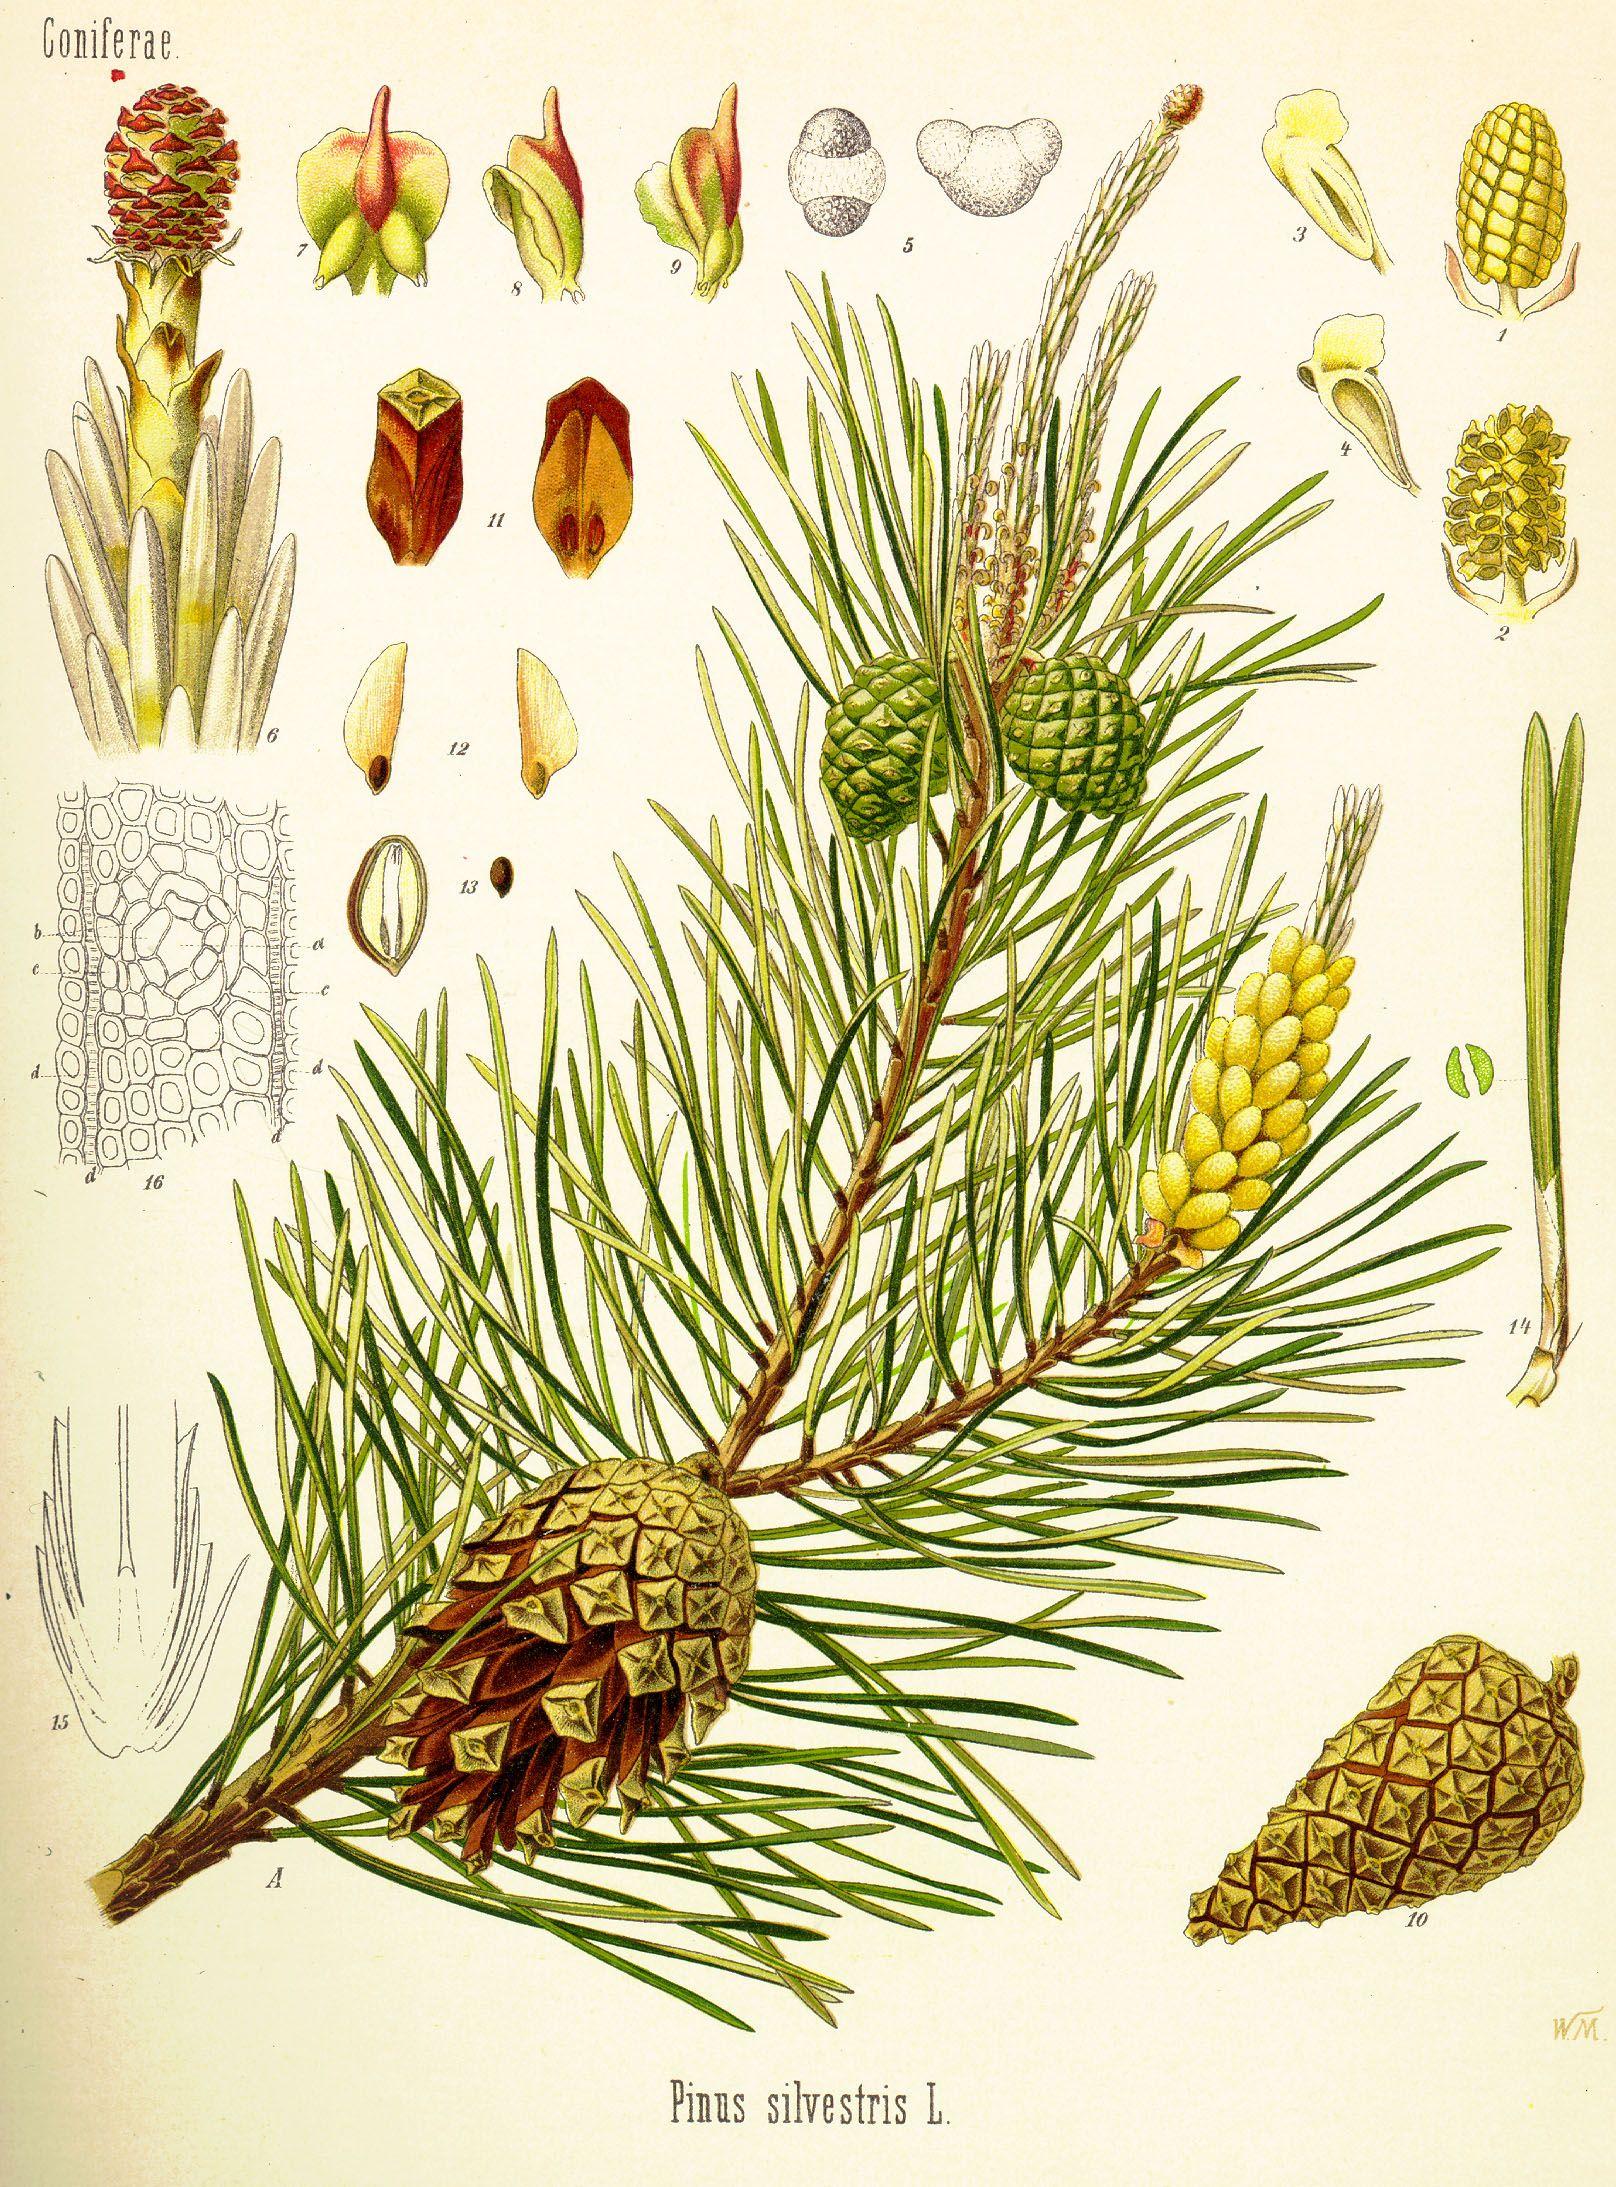 Conifere Pinus Sylvestris Sempreverde Si Adatta A Condizioni